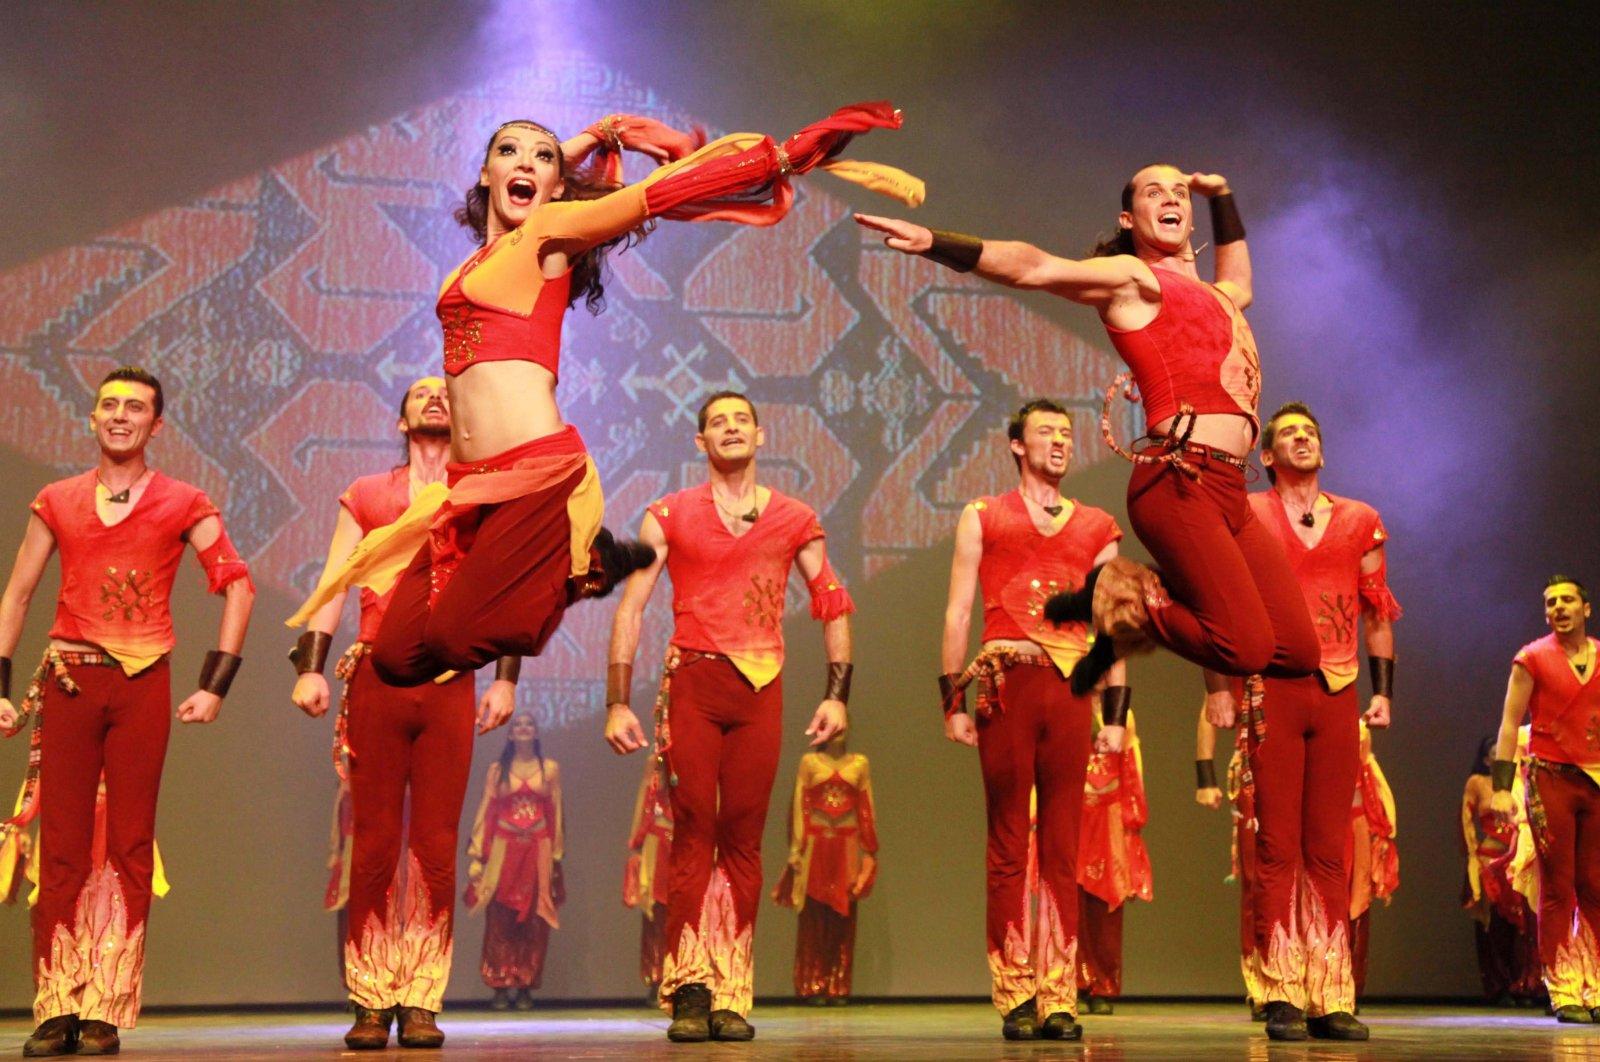 A photo from Fire of Anatolia's performance at Expo 2012 Yeosu Korea in Yeosu, South Korea, June 6, 2012. ( AA Photo)